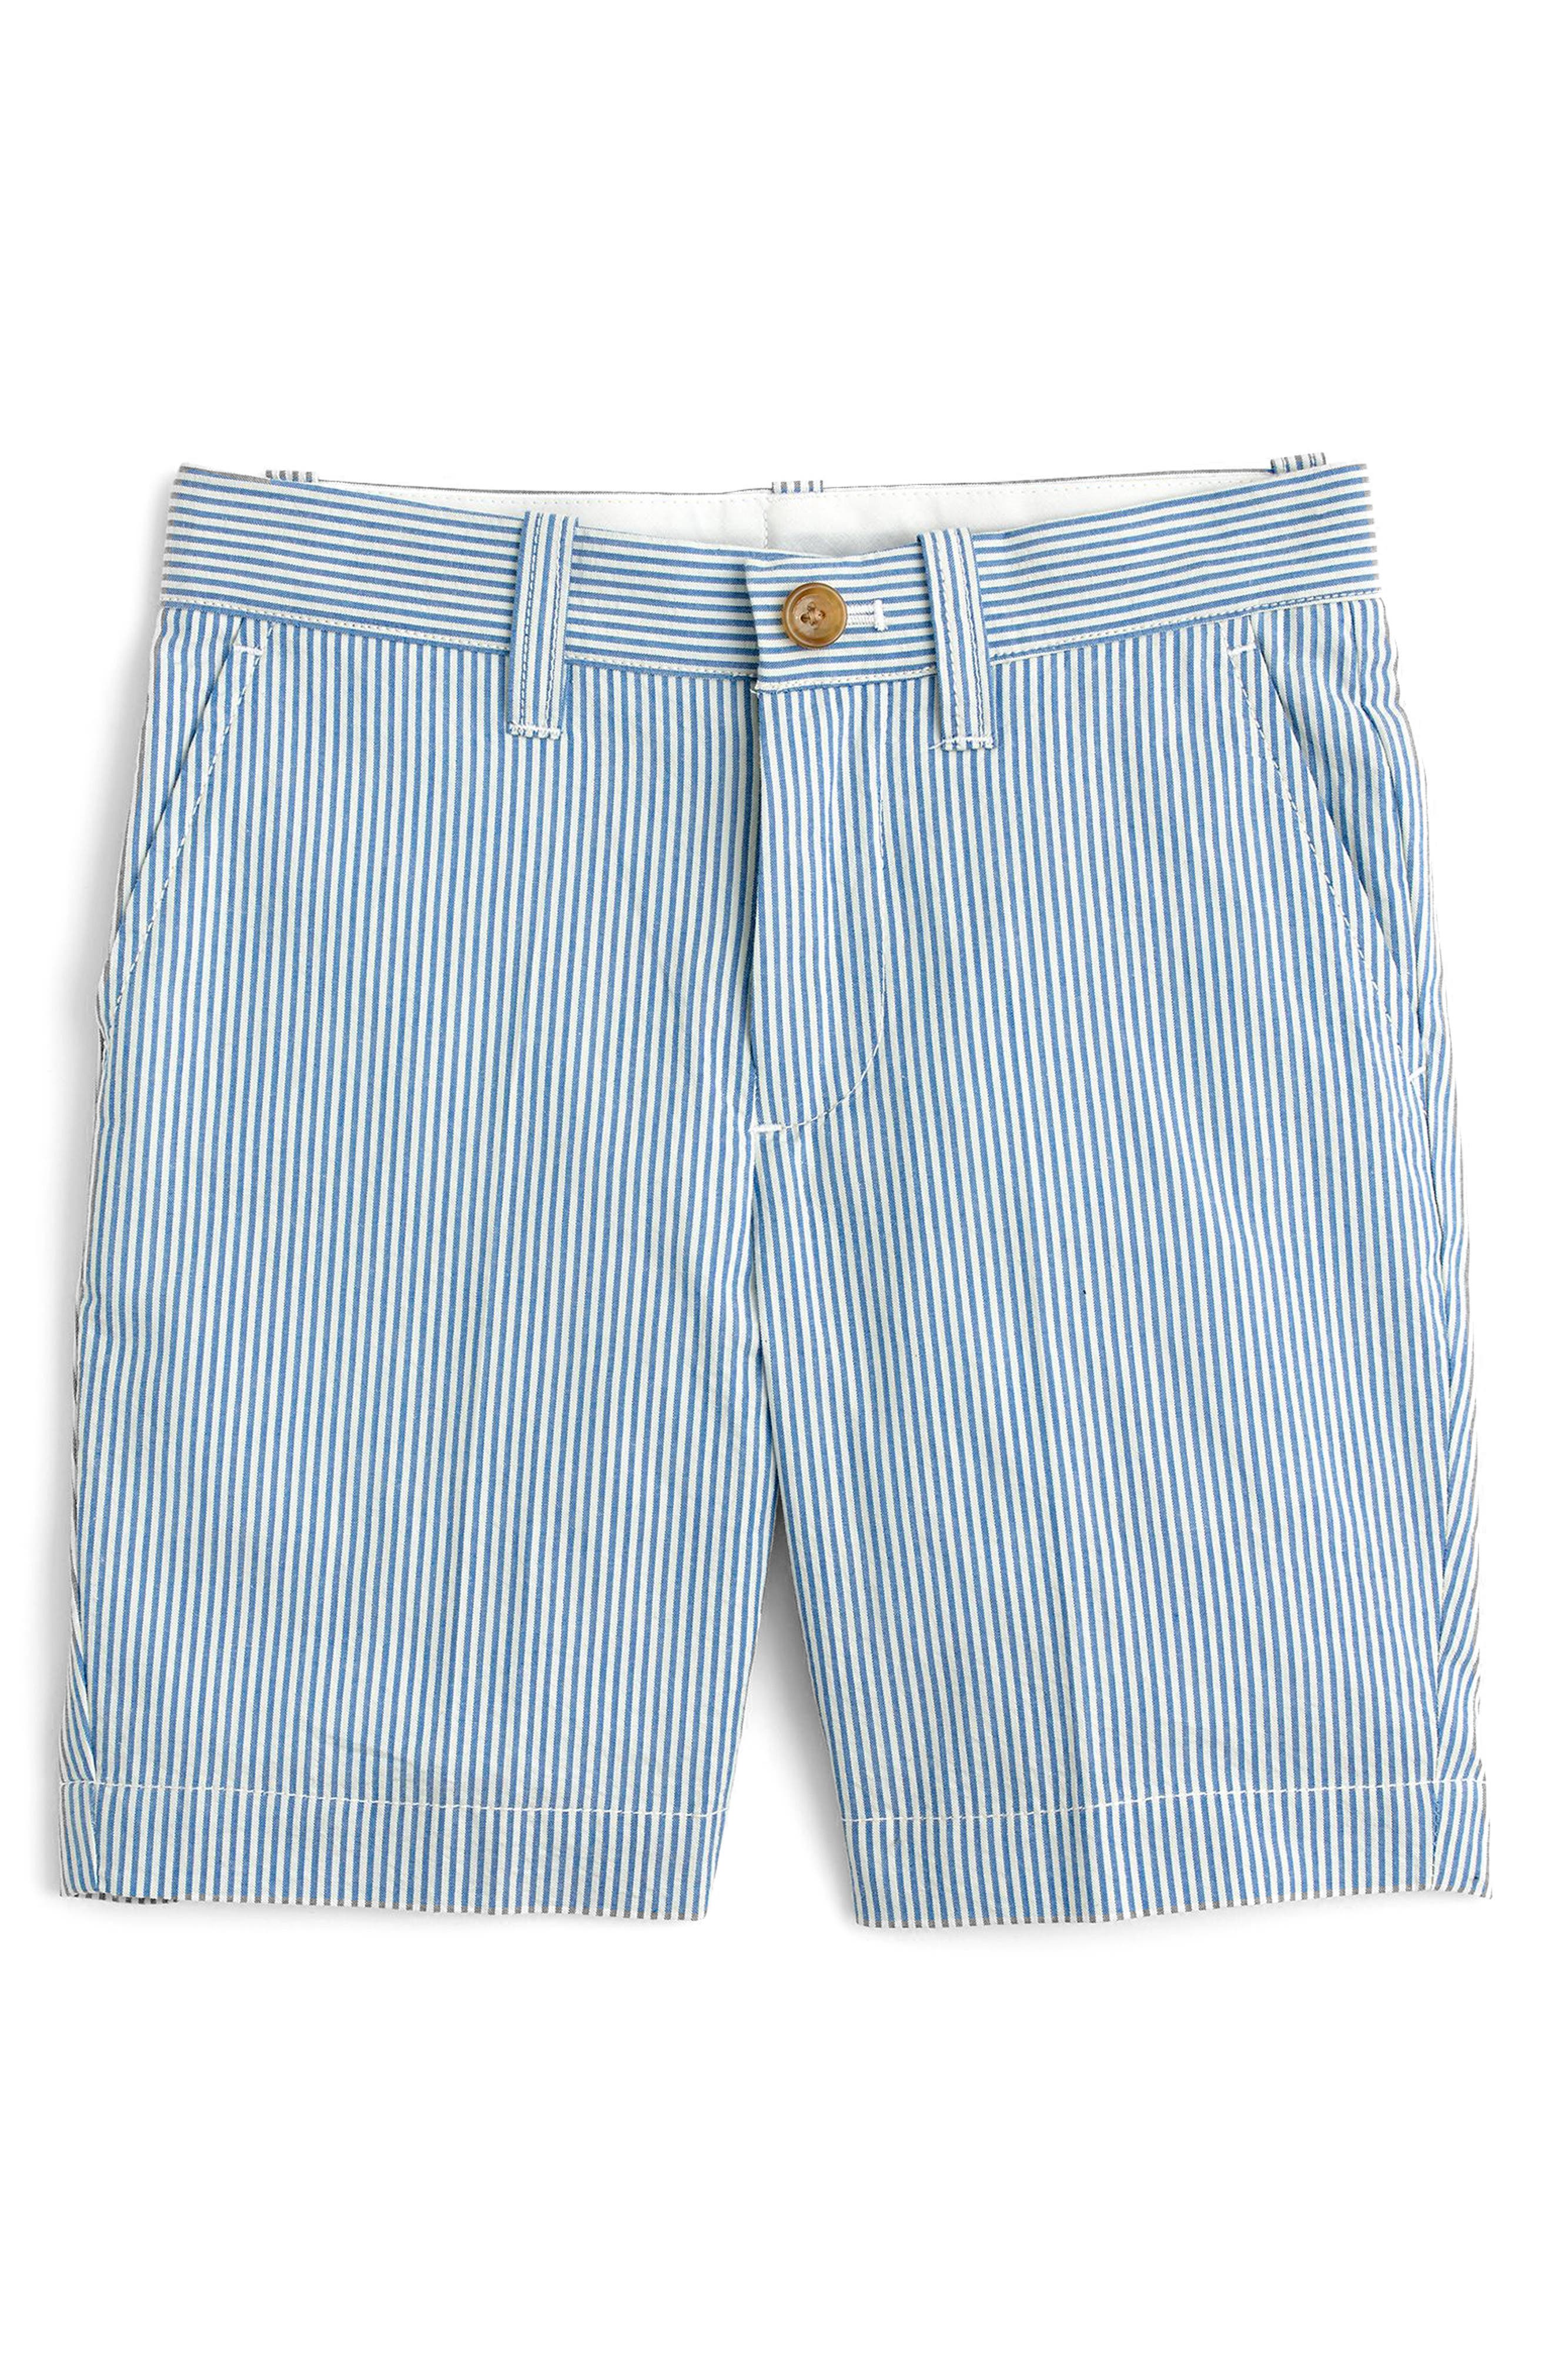 Seersucker Shorts,                         Main,                         color, Crisp Azure White